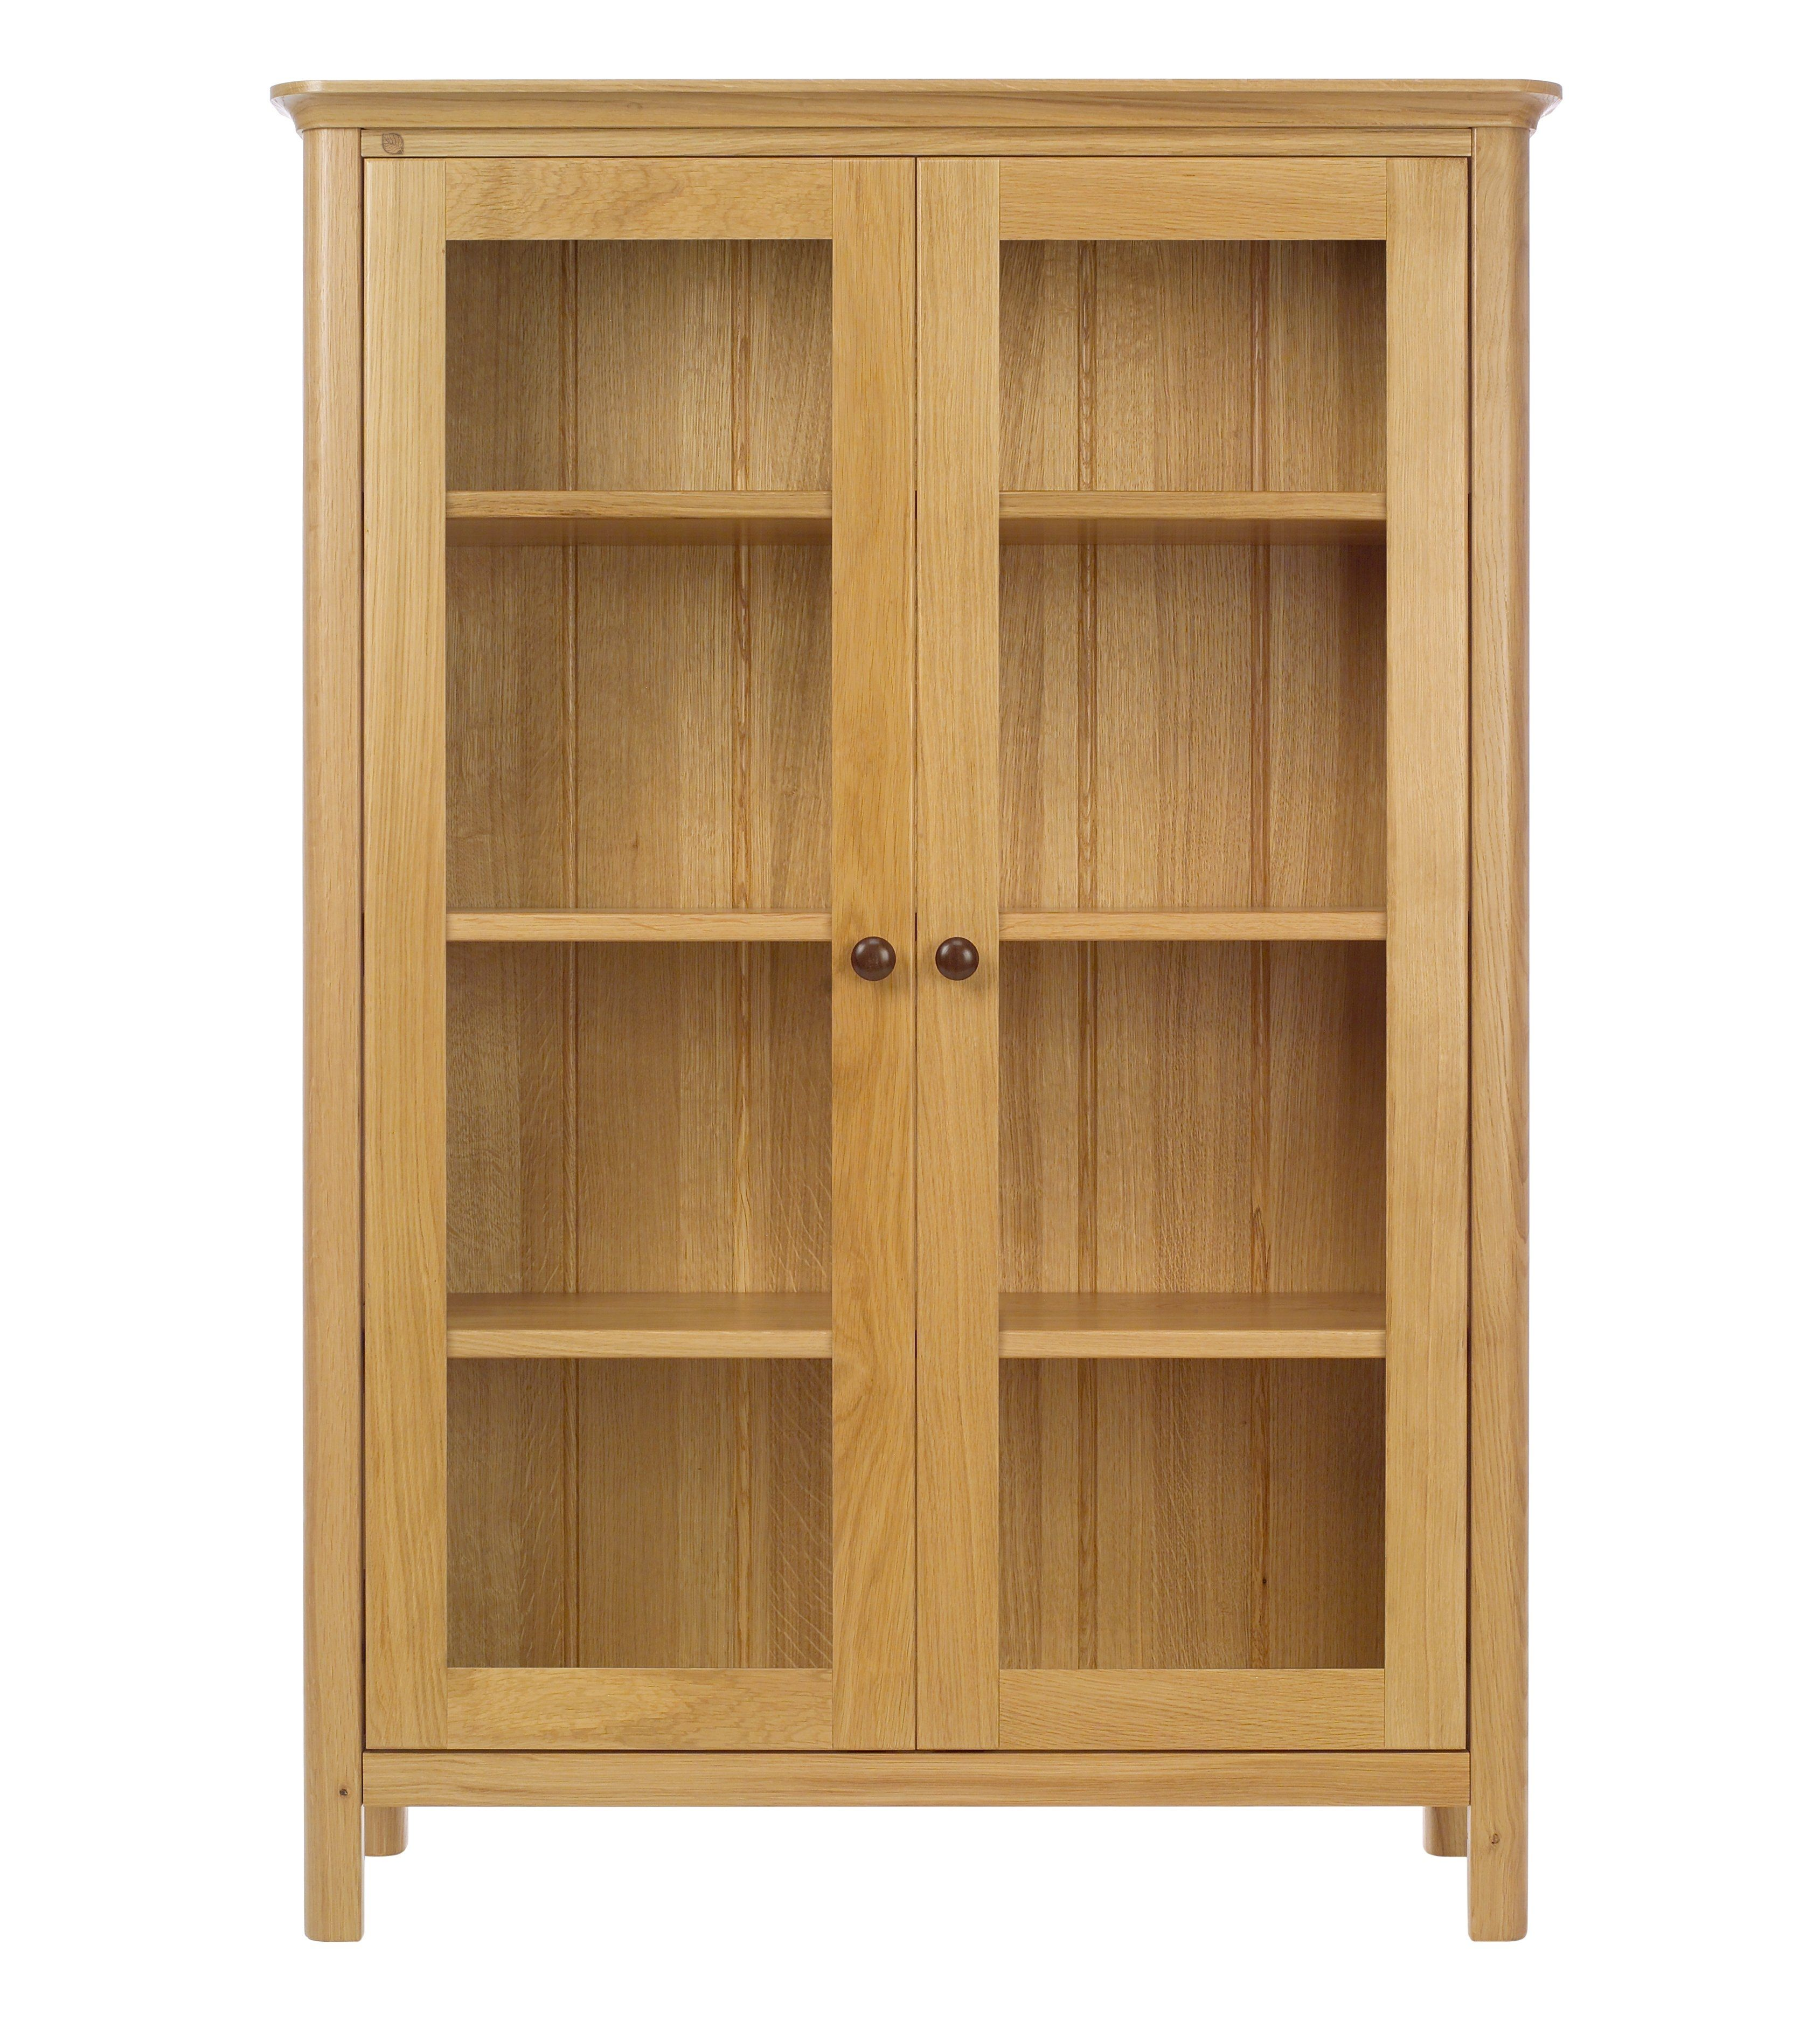 Wooden Shelf With Glass Doors Dolaplar Kitapliklar Ev Dekoru Wood bookcase with glass doors